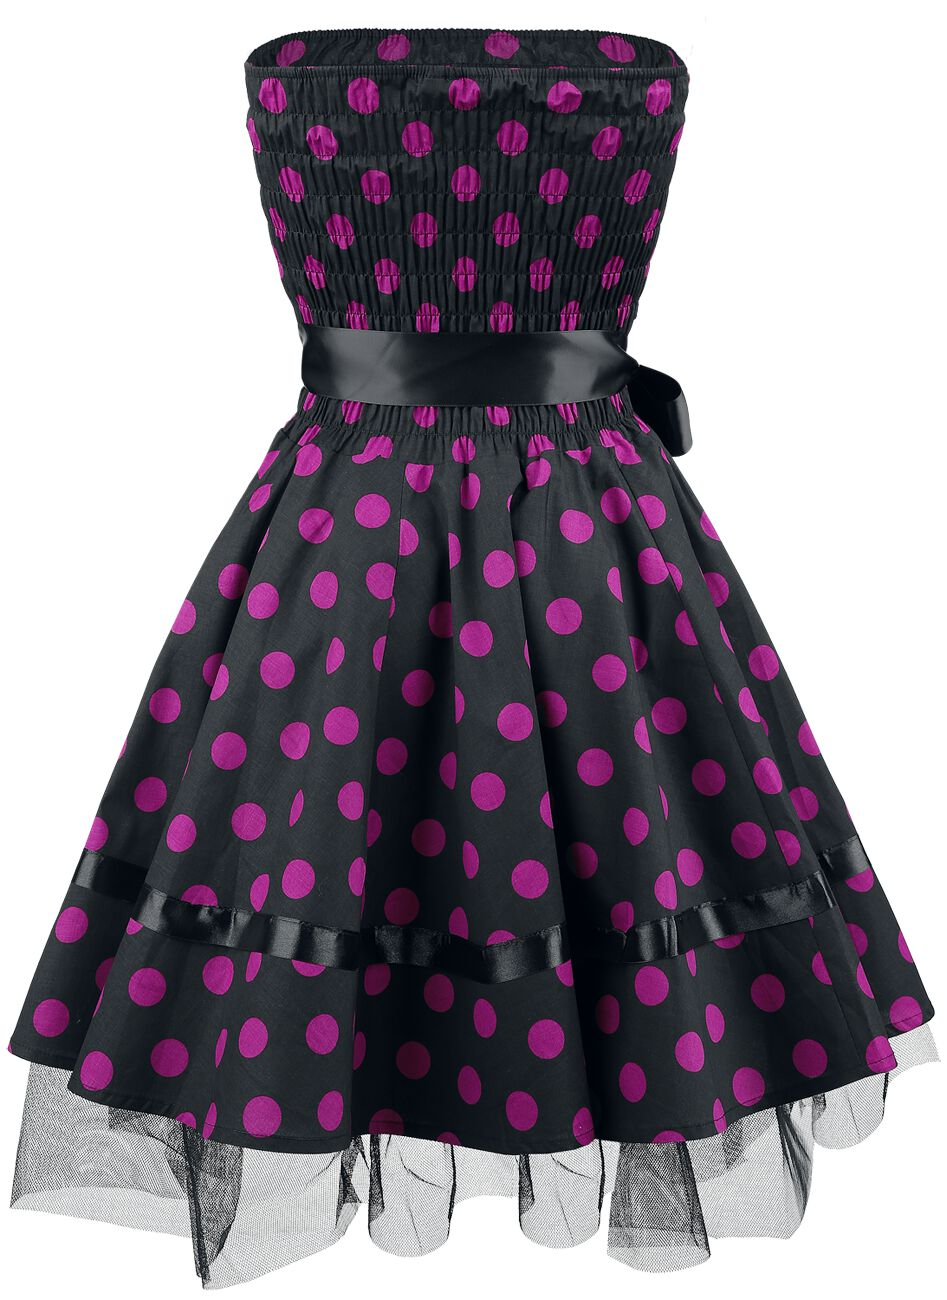 12399cd0 Kjole med lilla prikker   H&R London Kort kjole   EMP